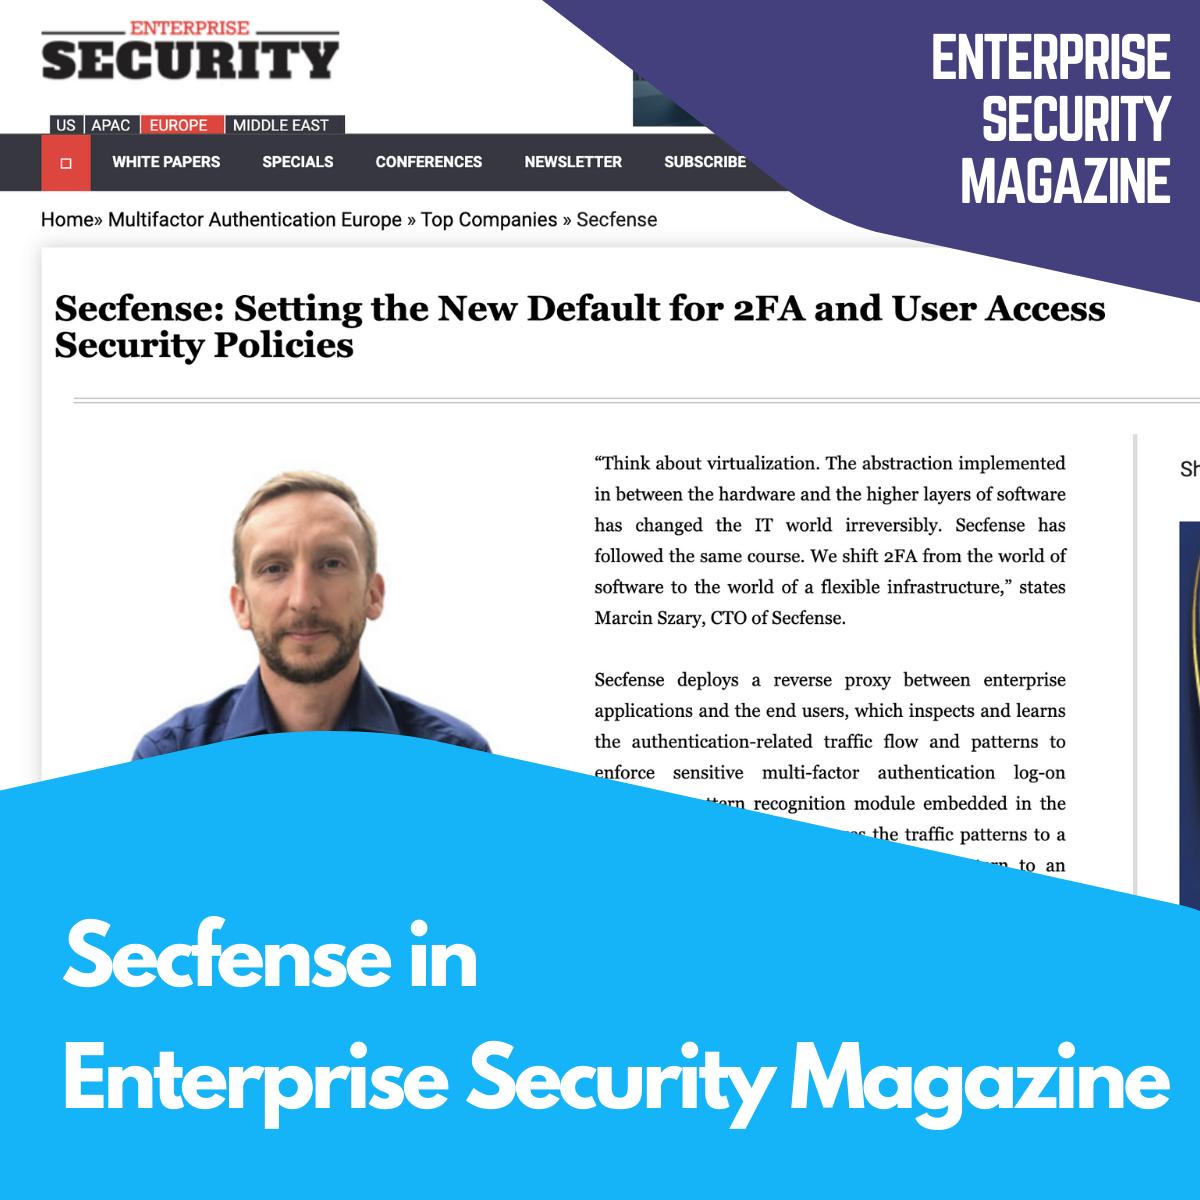 Enterprise Security Magazine about Secfense